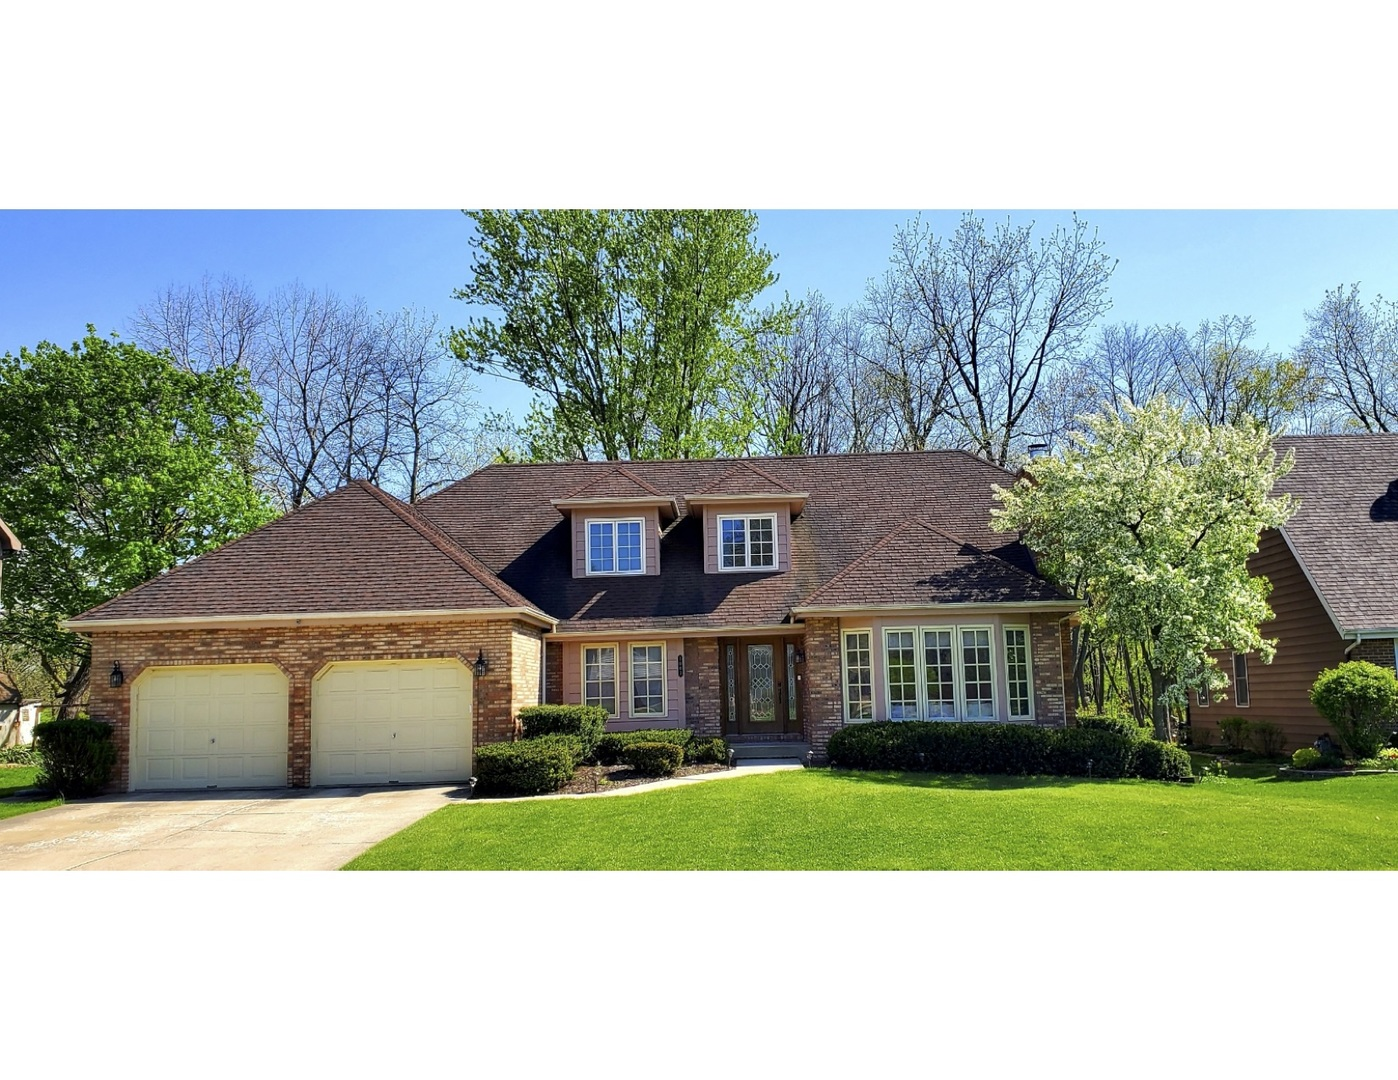 1003 Windsor Drive, Shorewood, Illinois